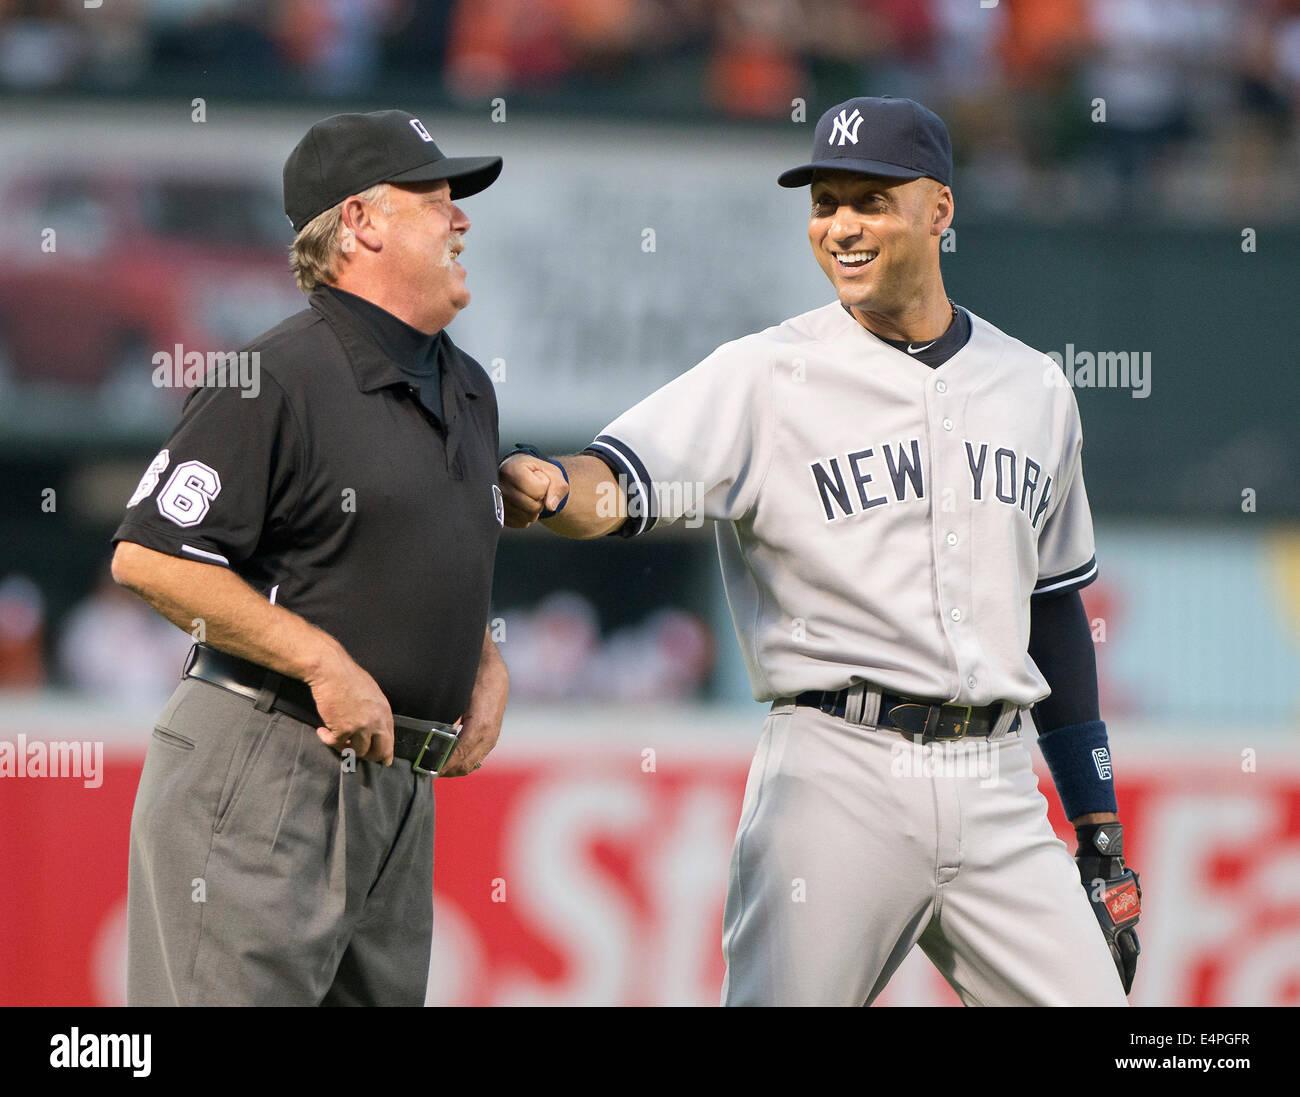 New York Yankees Shortstop Derek Jeter 2 Shares A Light Moment With Third Base